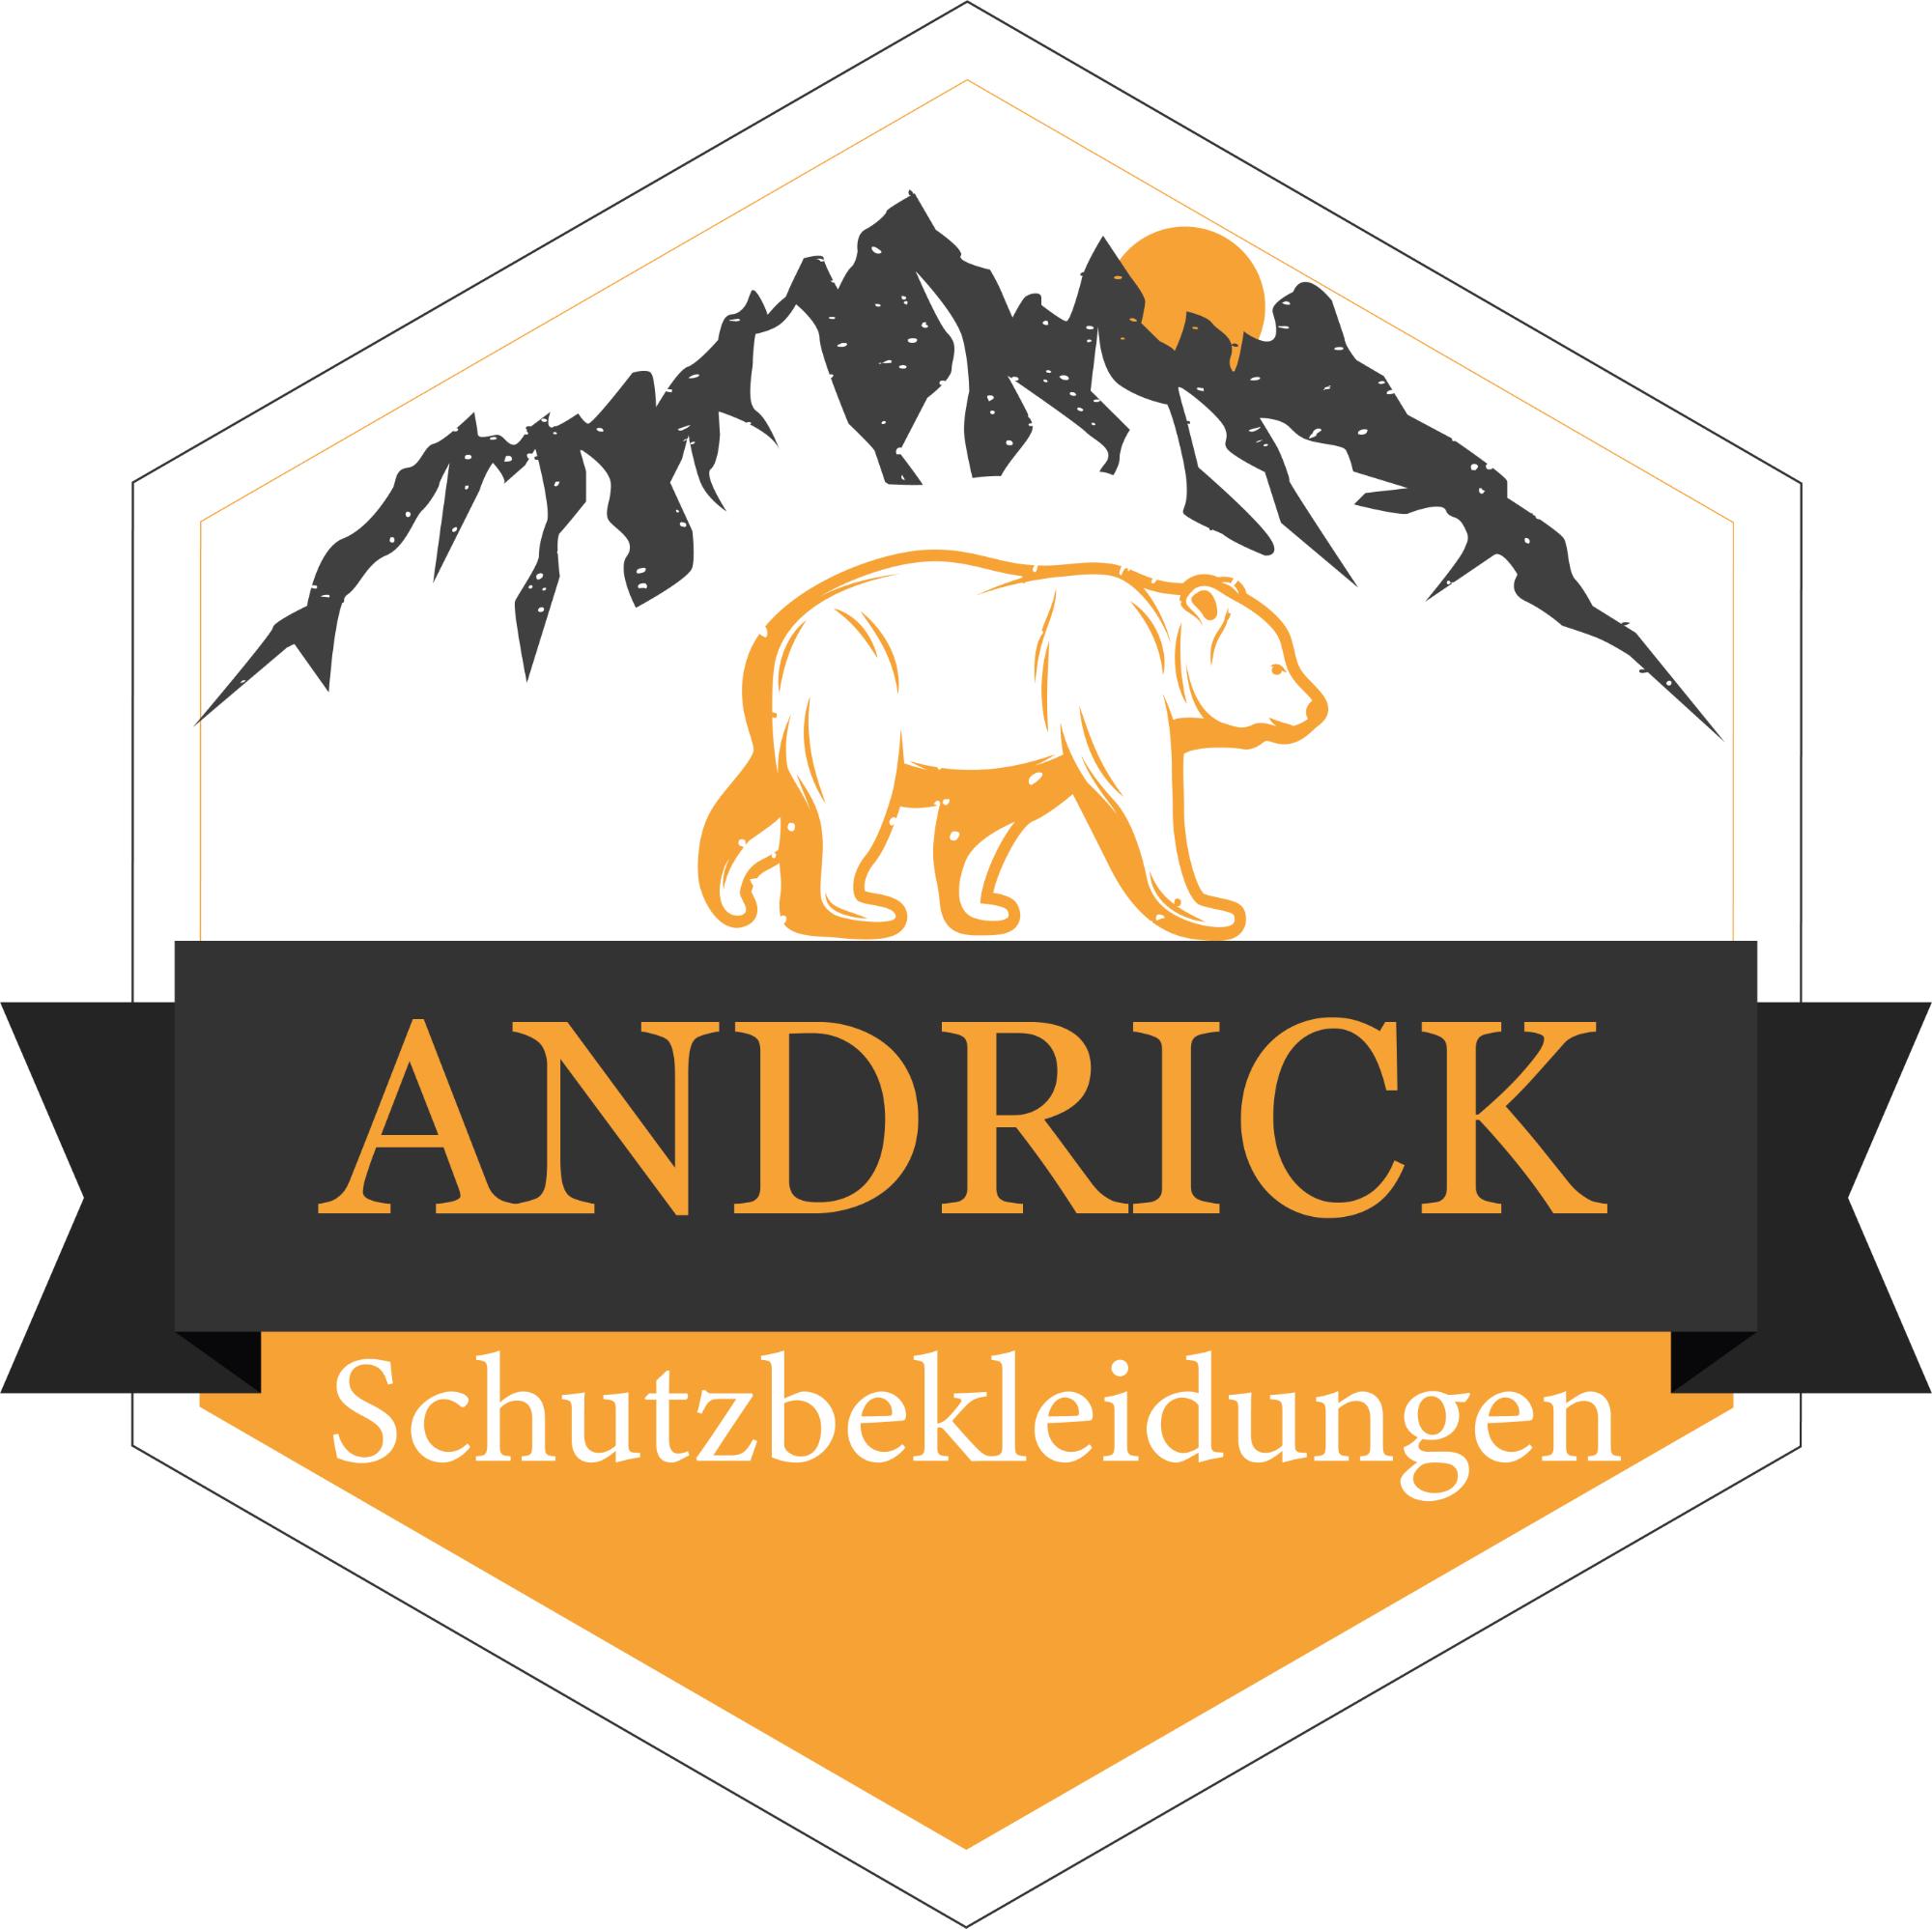 Andrick Schutzbekleidungen